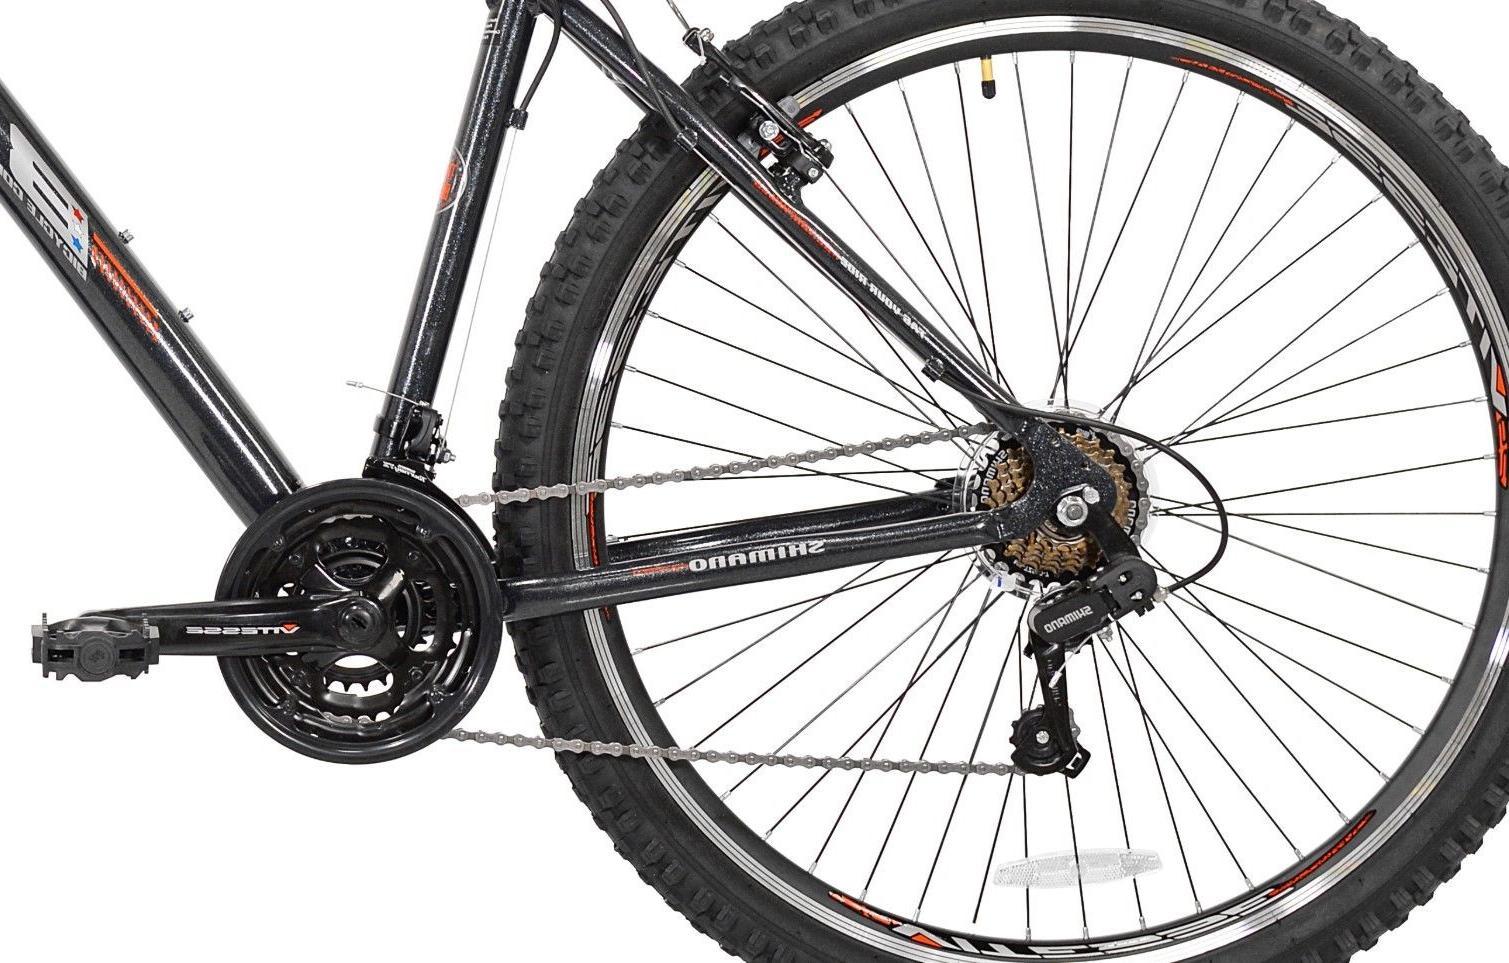 Aluminum 21 Bicycle Disc New!